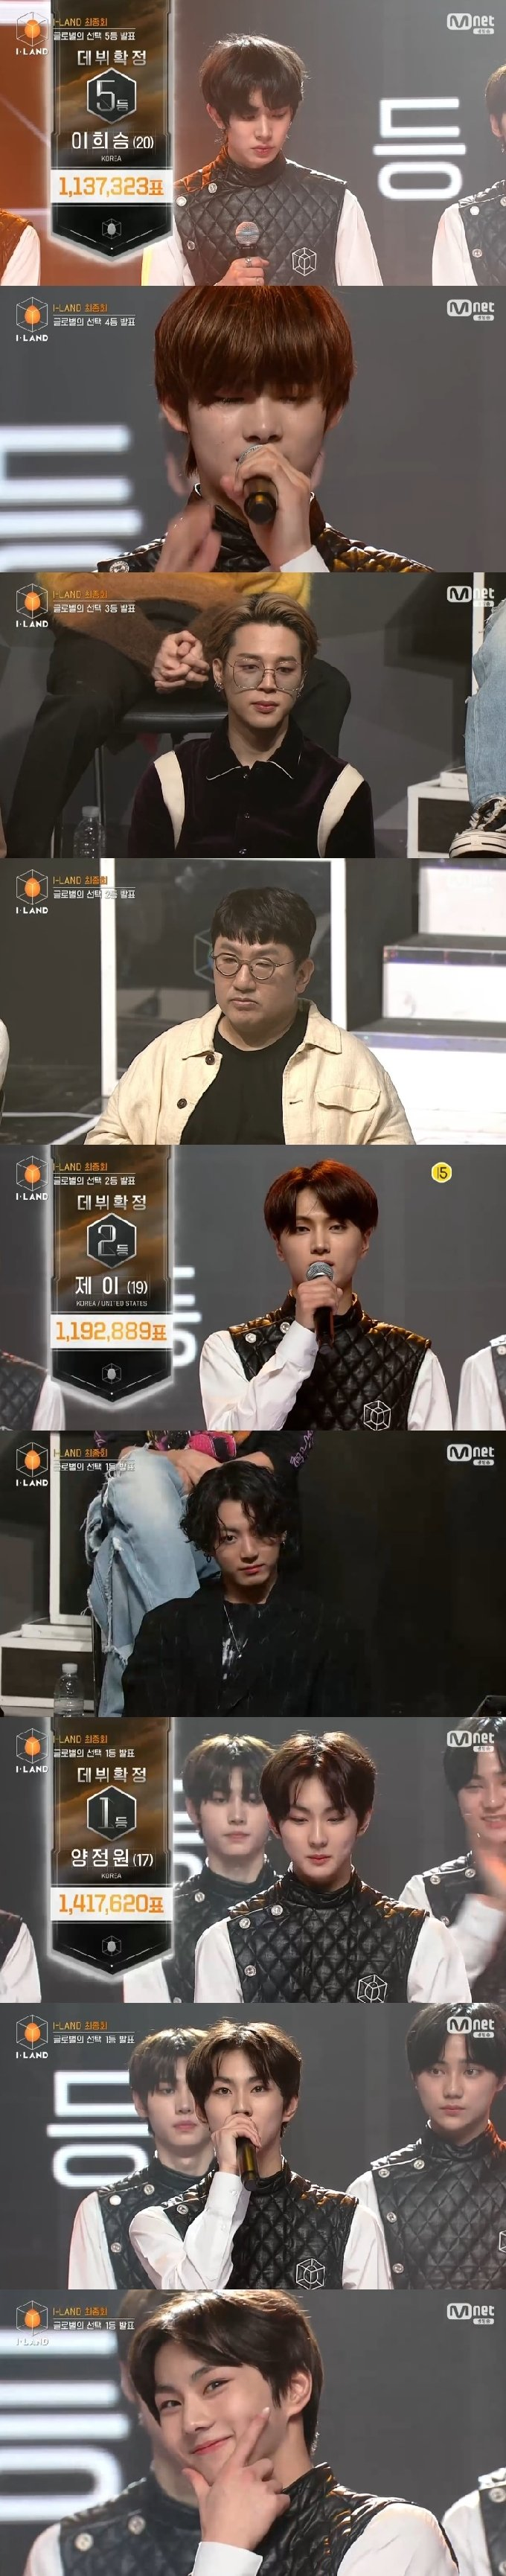 Mnet '아이랜드' 캡처 © 뉴스1